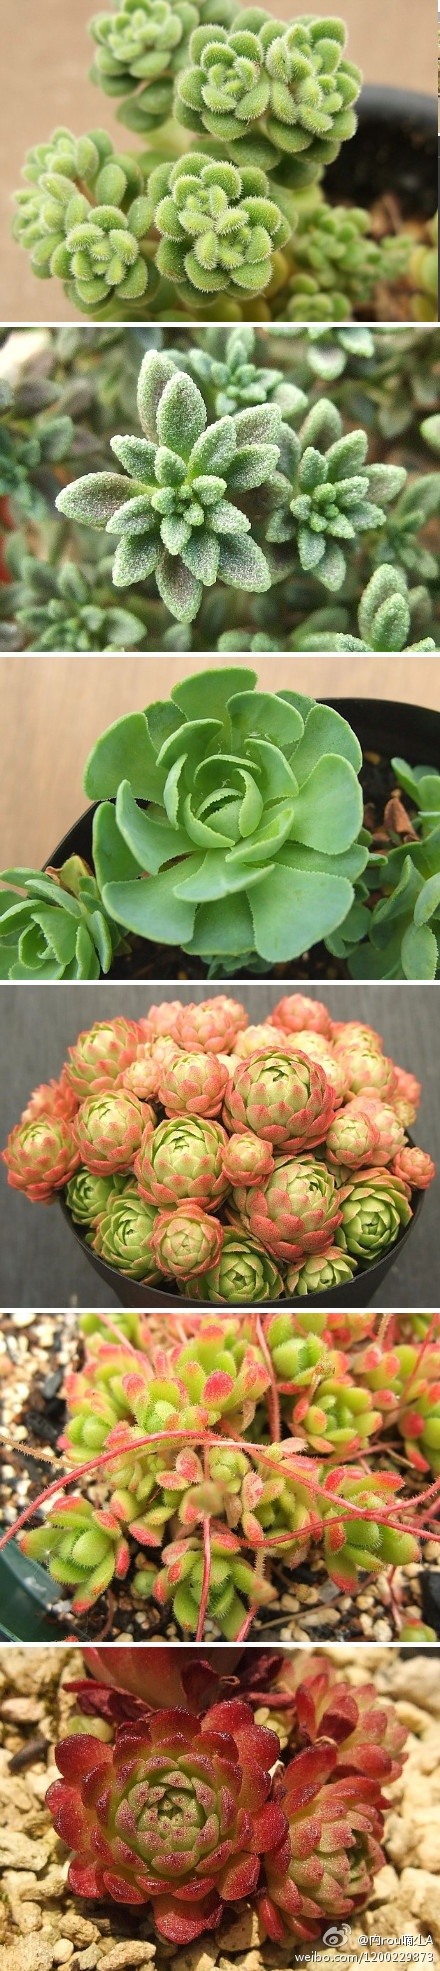 best succulent splendor images on pinterest house plants